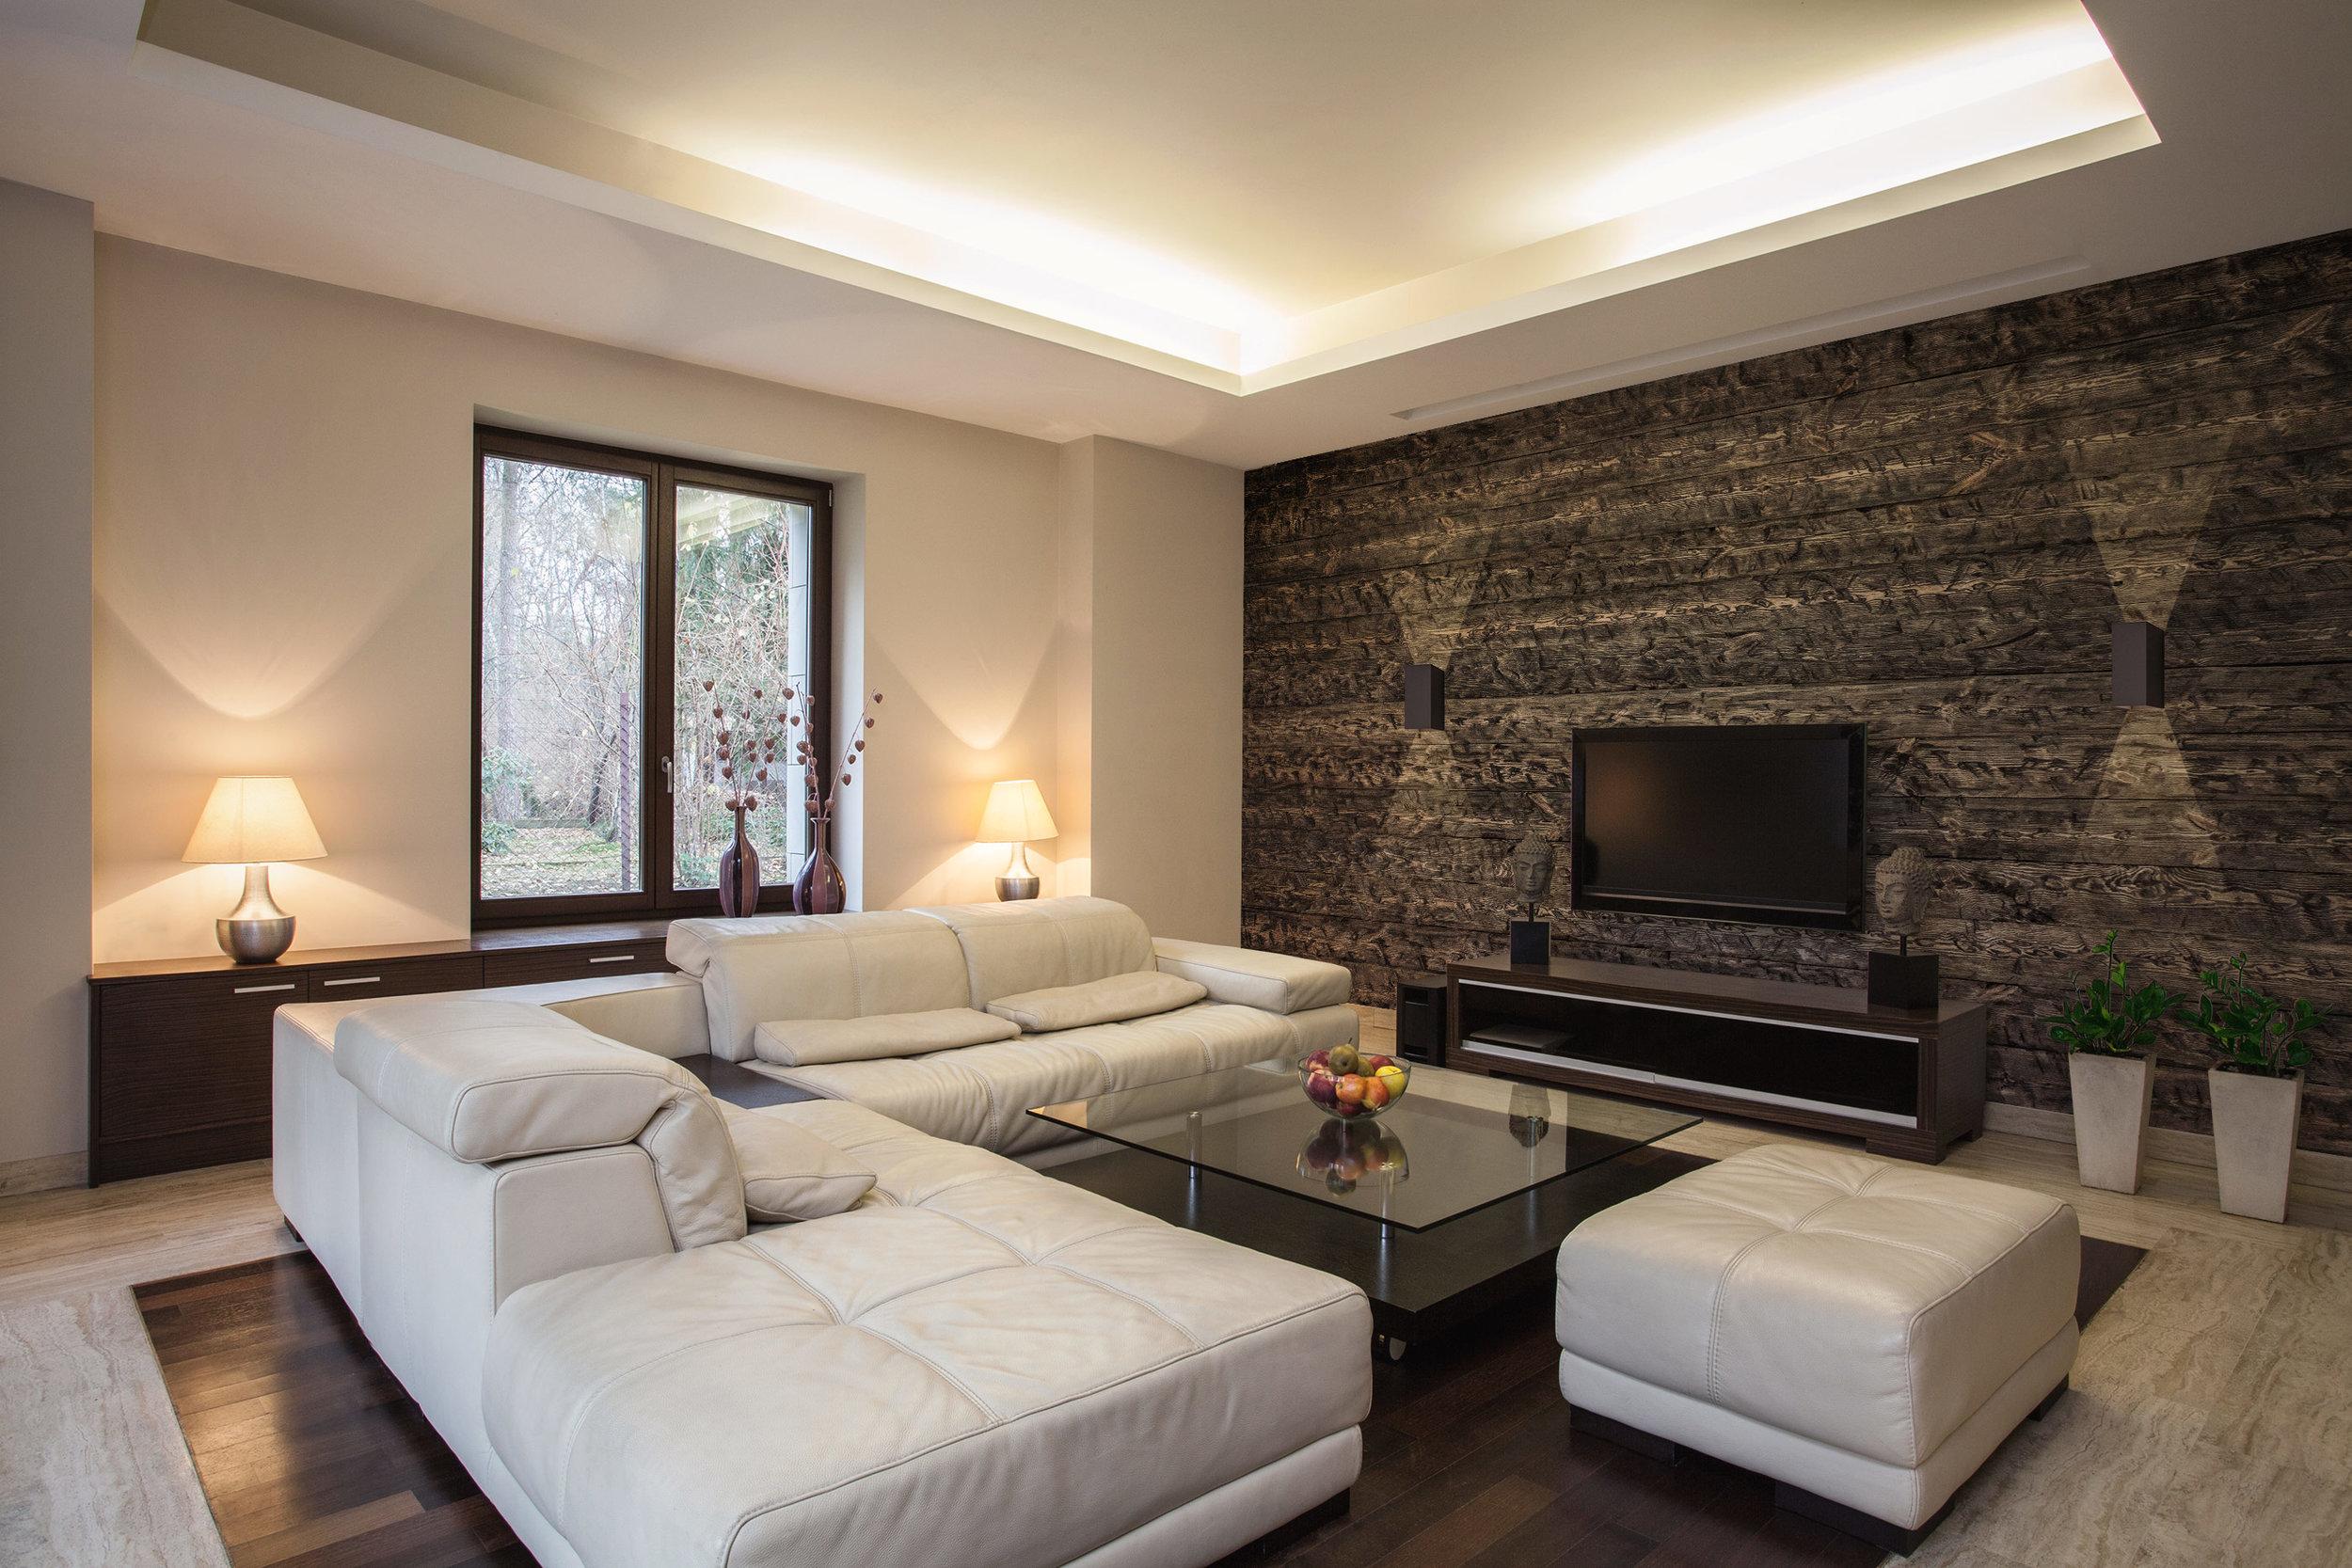 rwood-living-room-wooden-wall-4.jpg